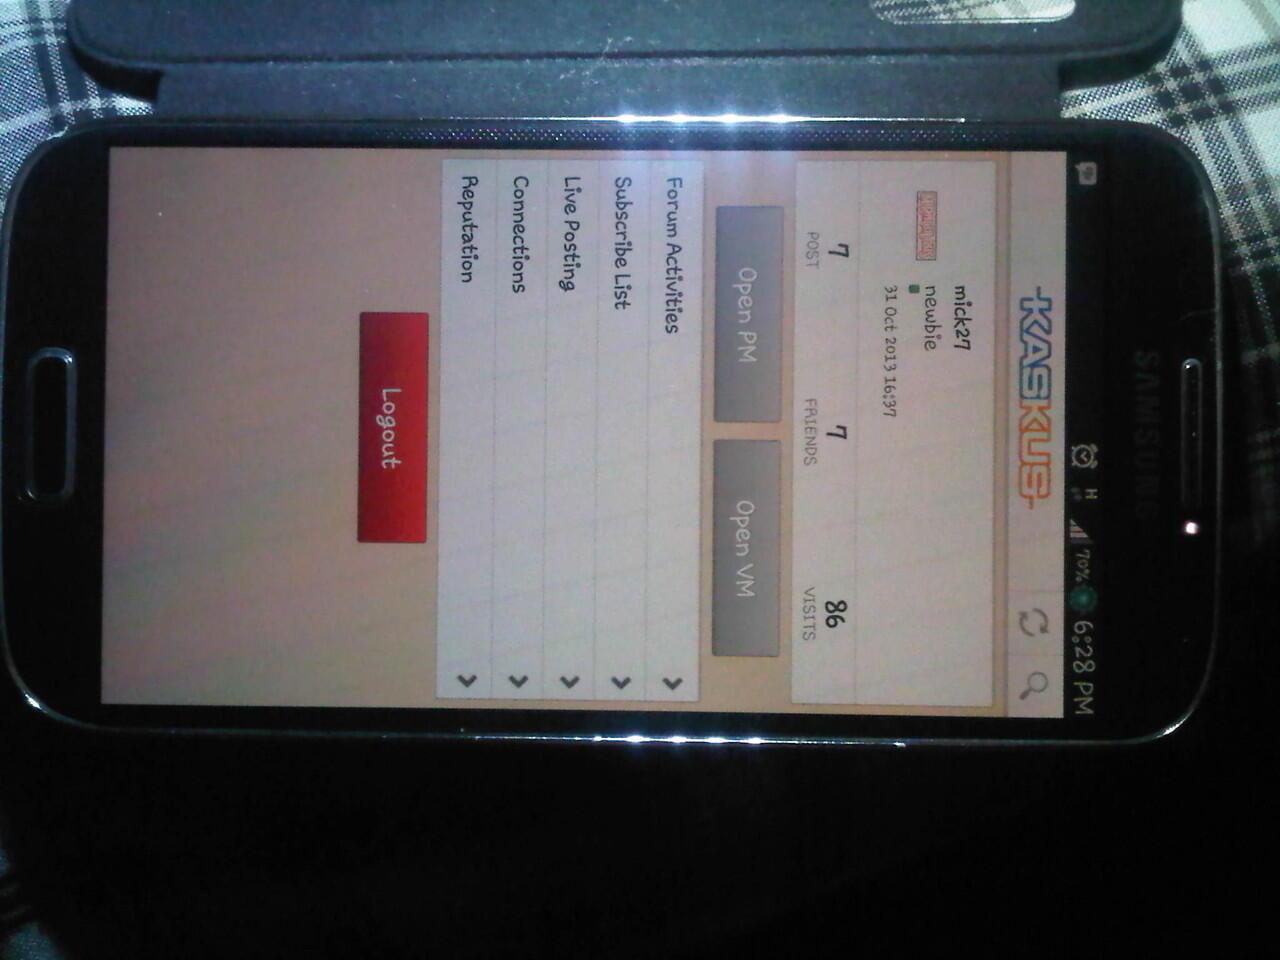 Samsung Galaxy S4 asli BUKAN REPLIKA